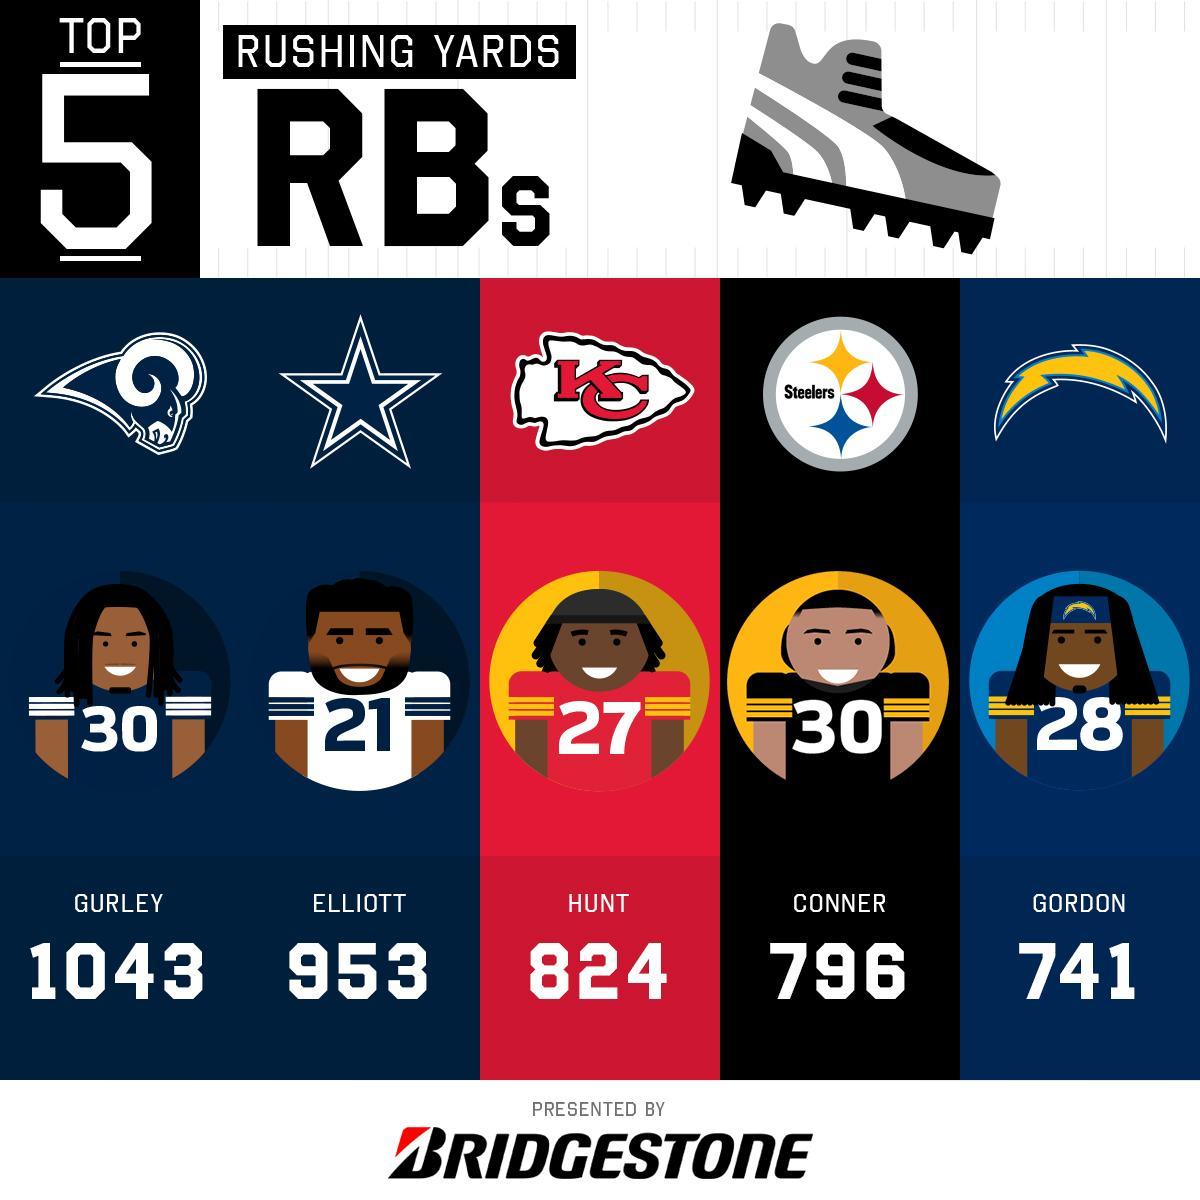 5a2022e0f06 2018 Rushing Yards Leaders through Week 11! (by  Bridgestone)pic.twitter .com PT23vzNECh